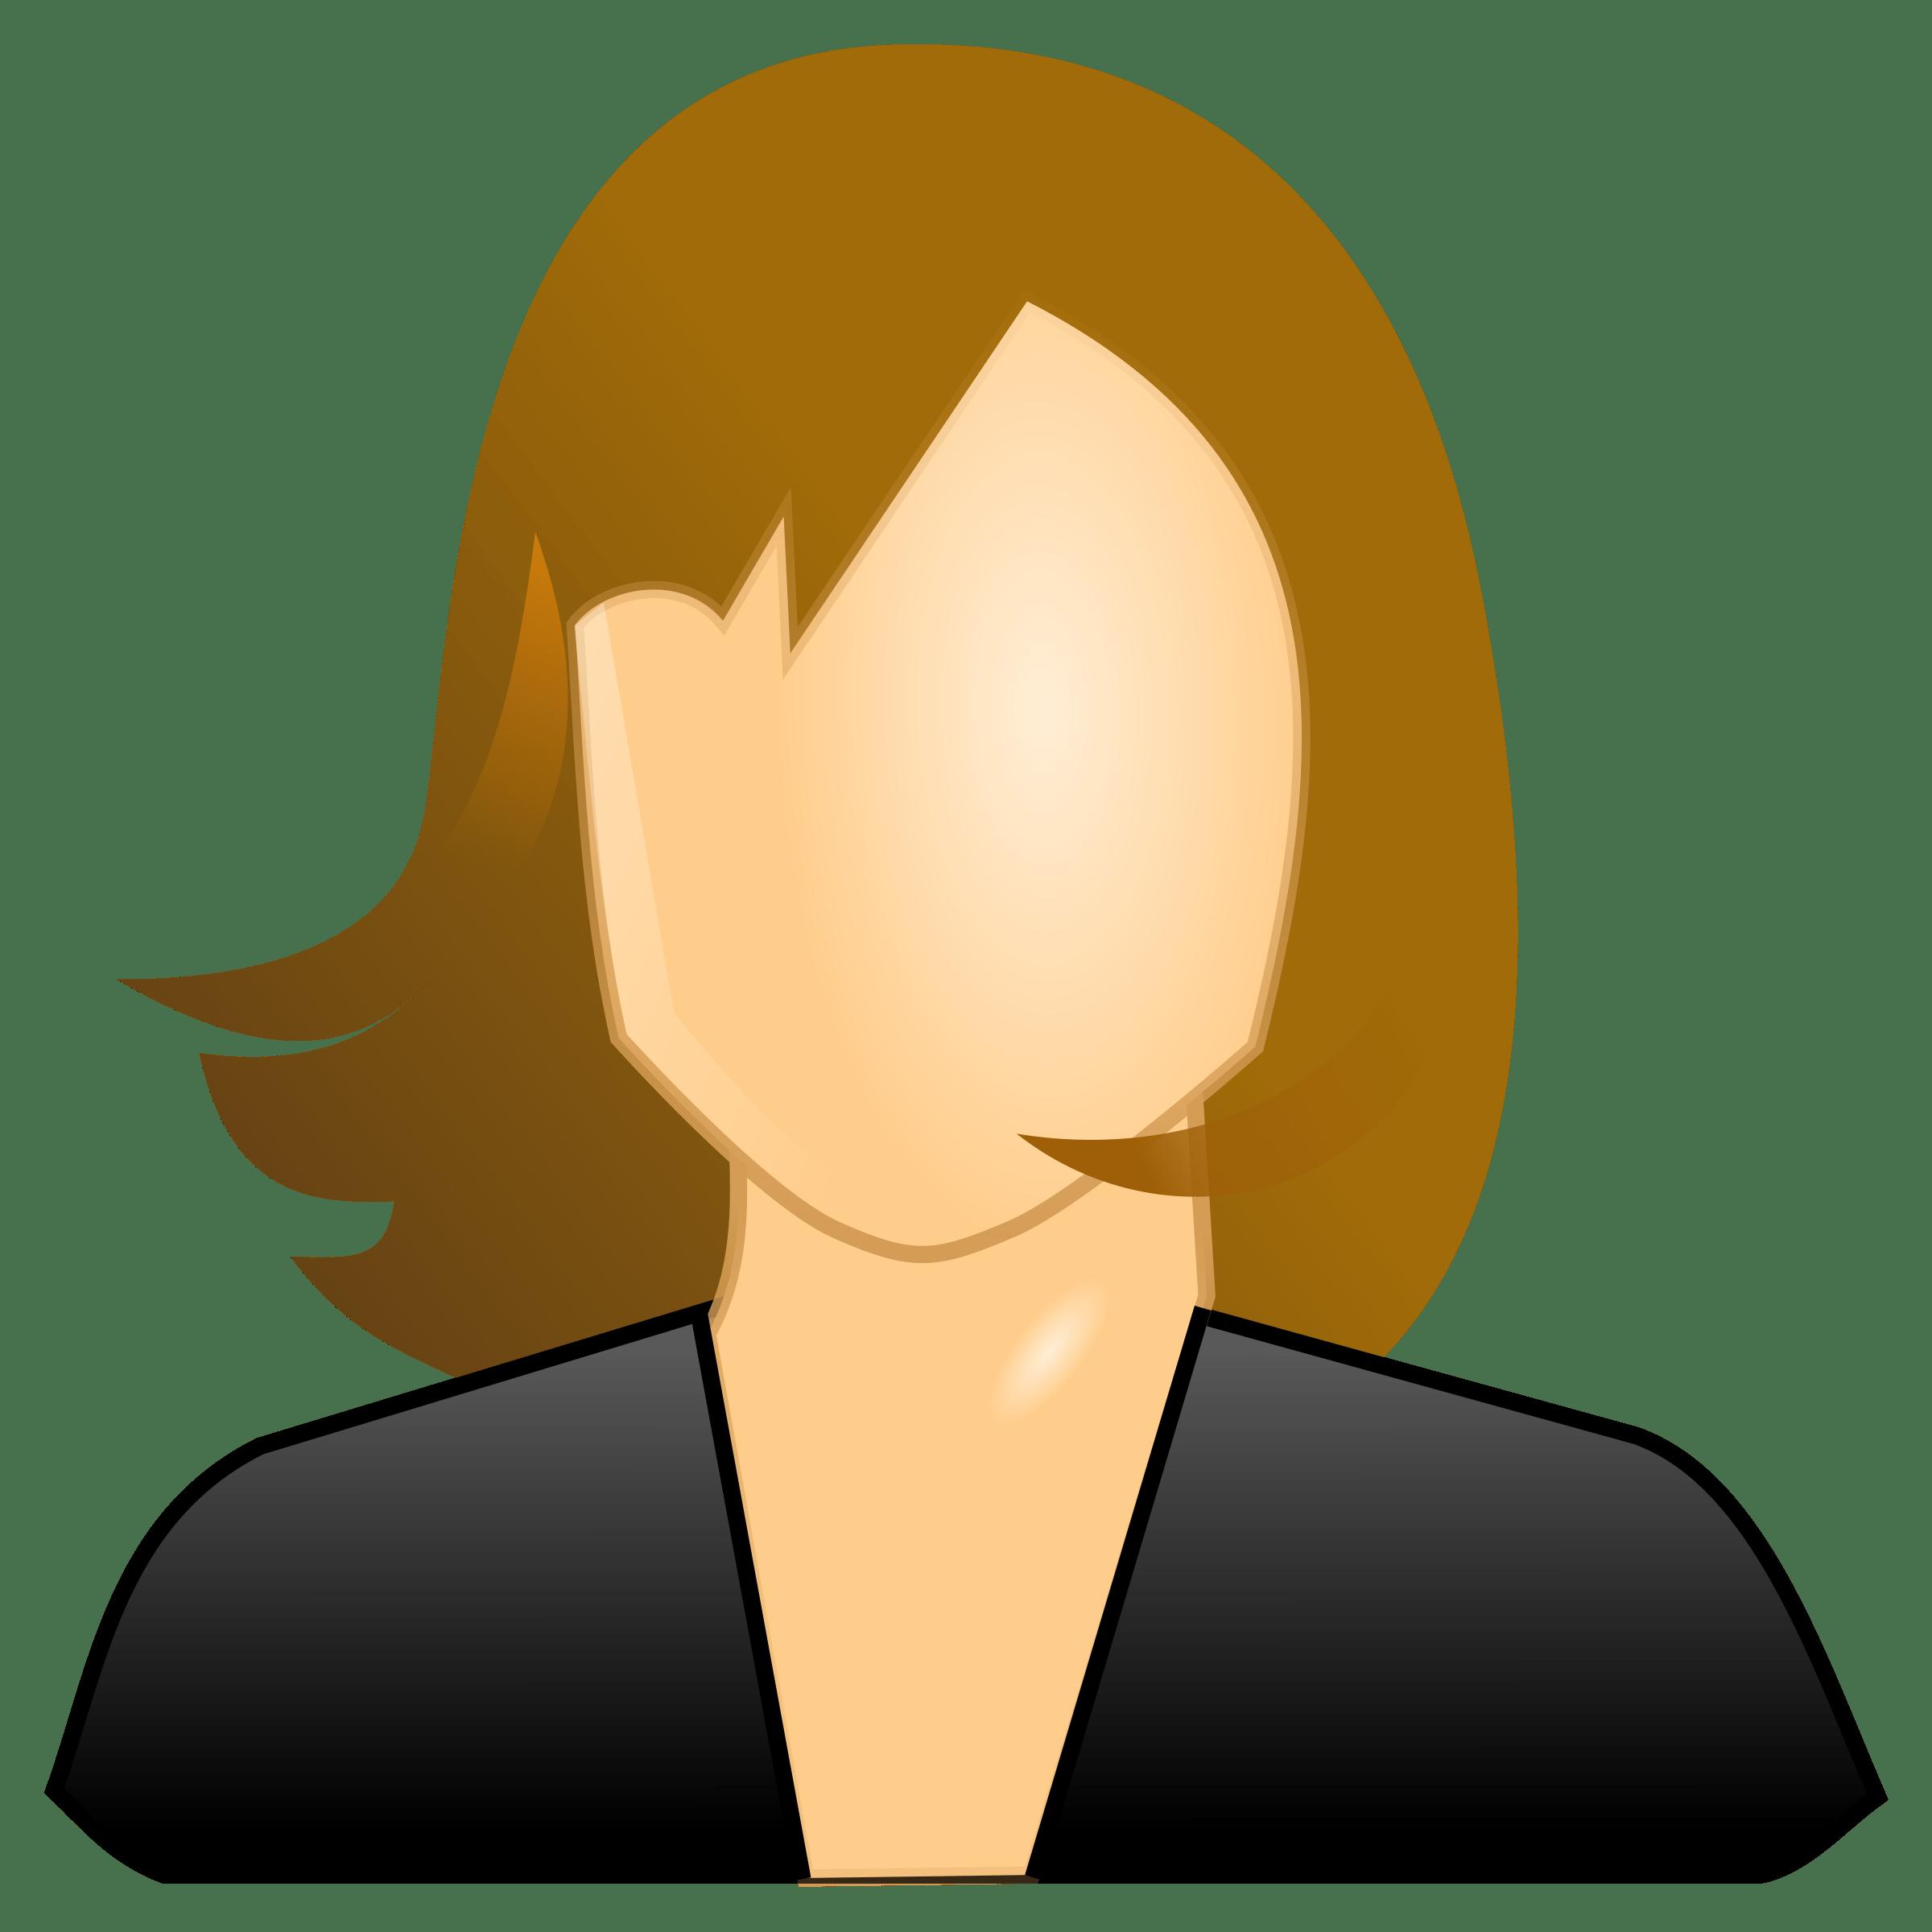 female - Request a Quote